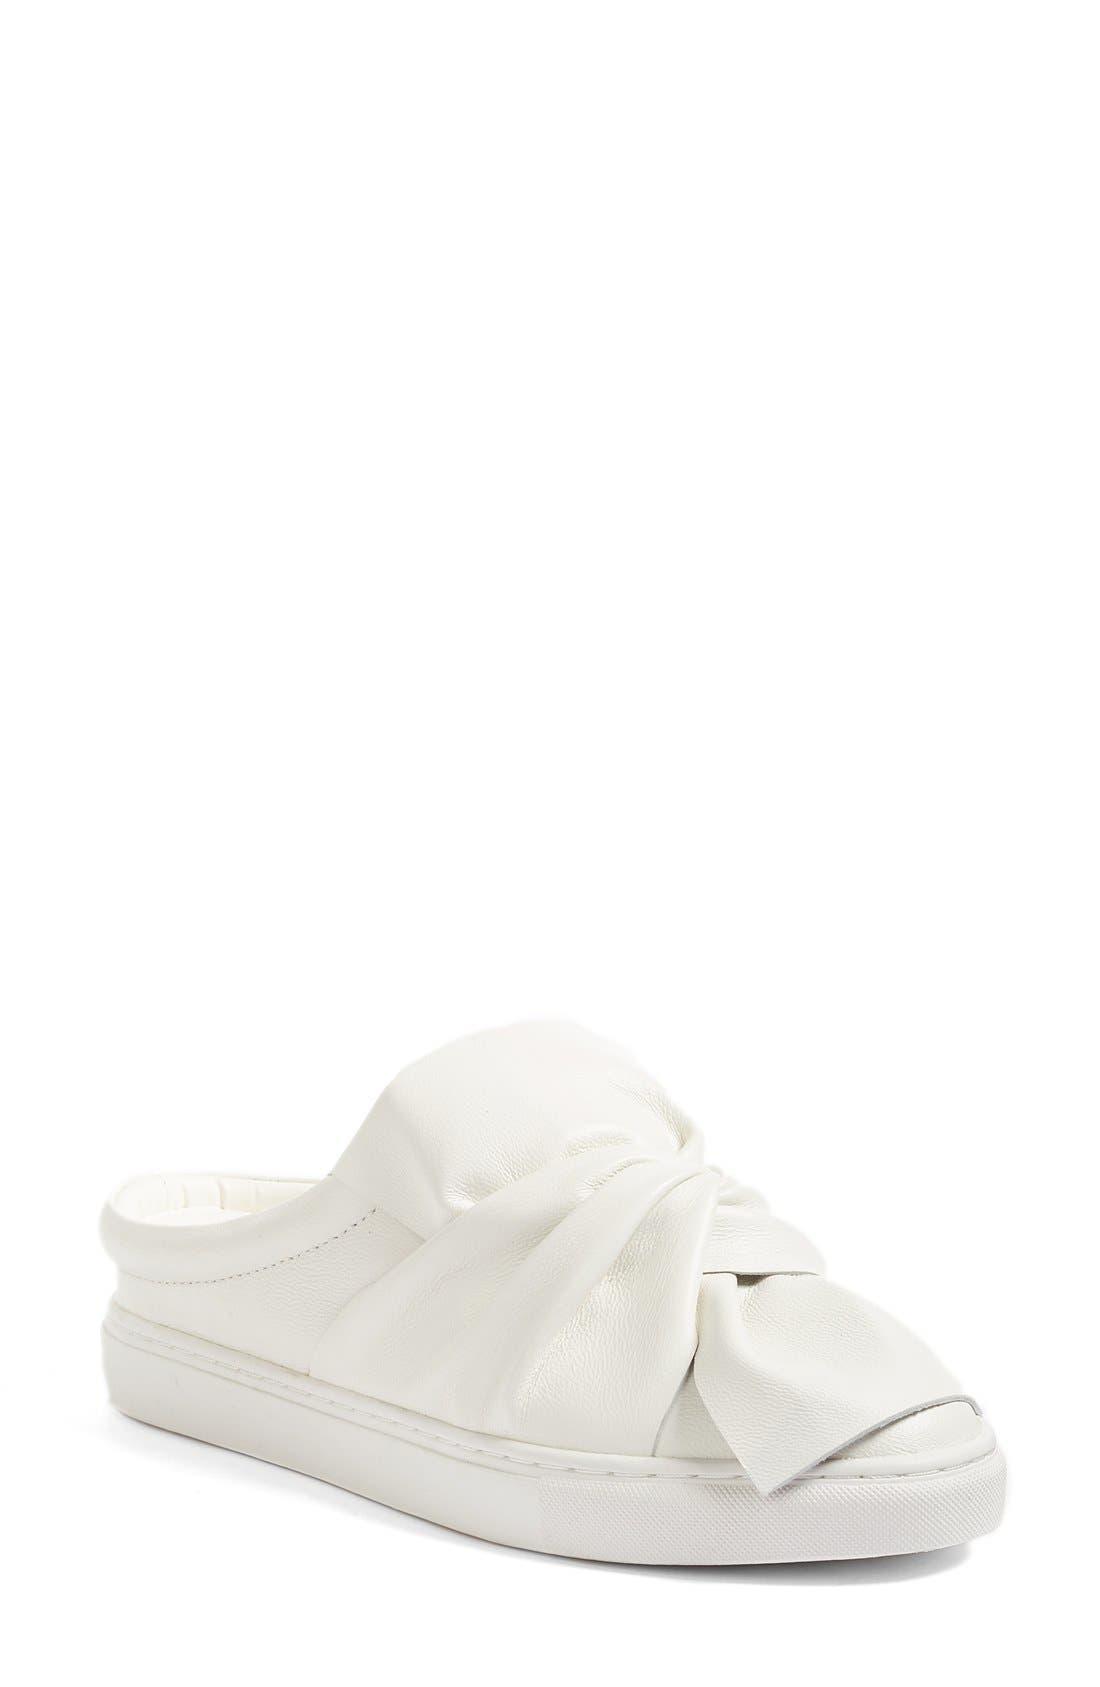 Alternate Image 1 Selected - Halogen® Manny Knotted Slip-On Sneaker (Women)